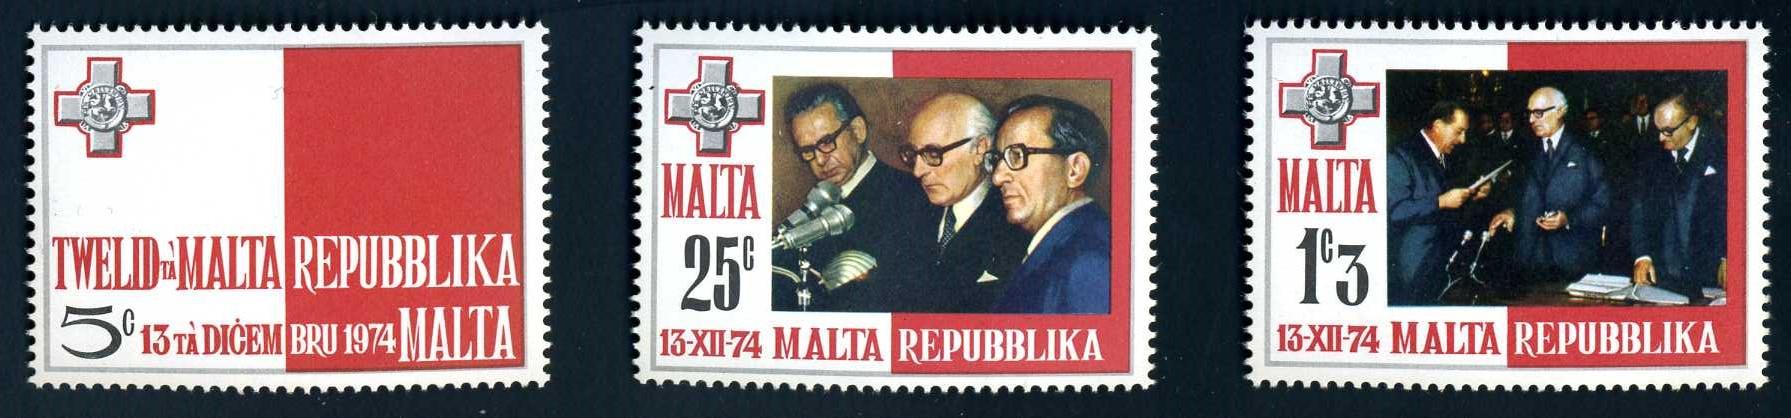 MT 196 1975 Republik.jpg